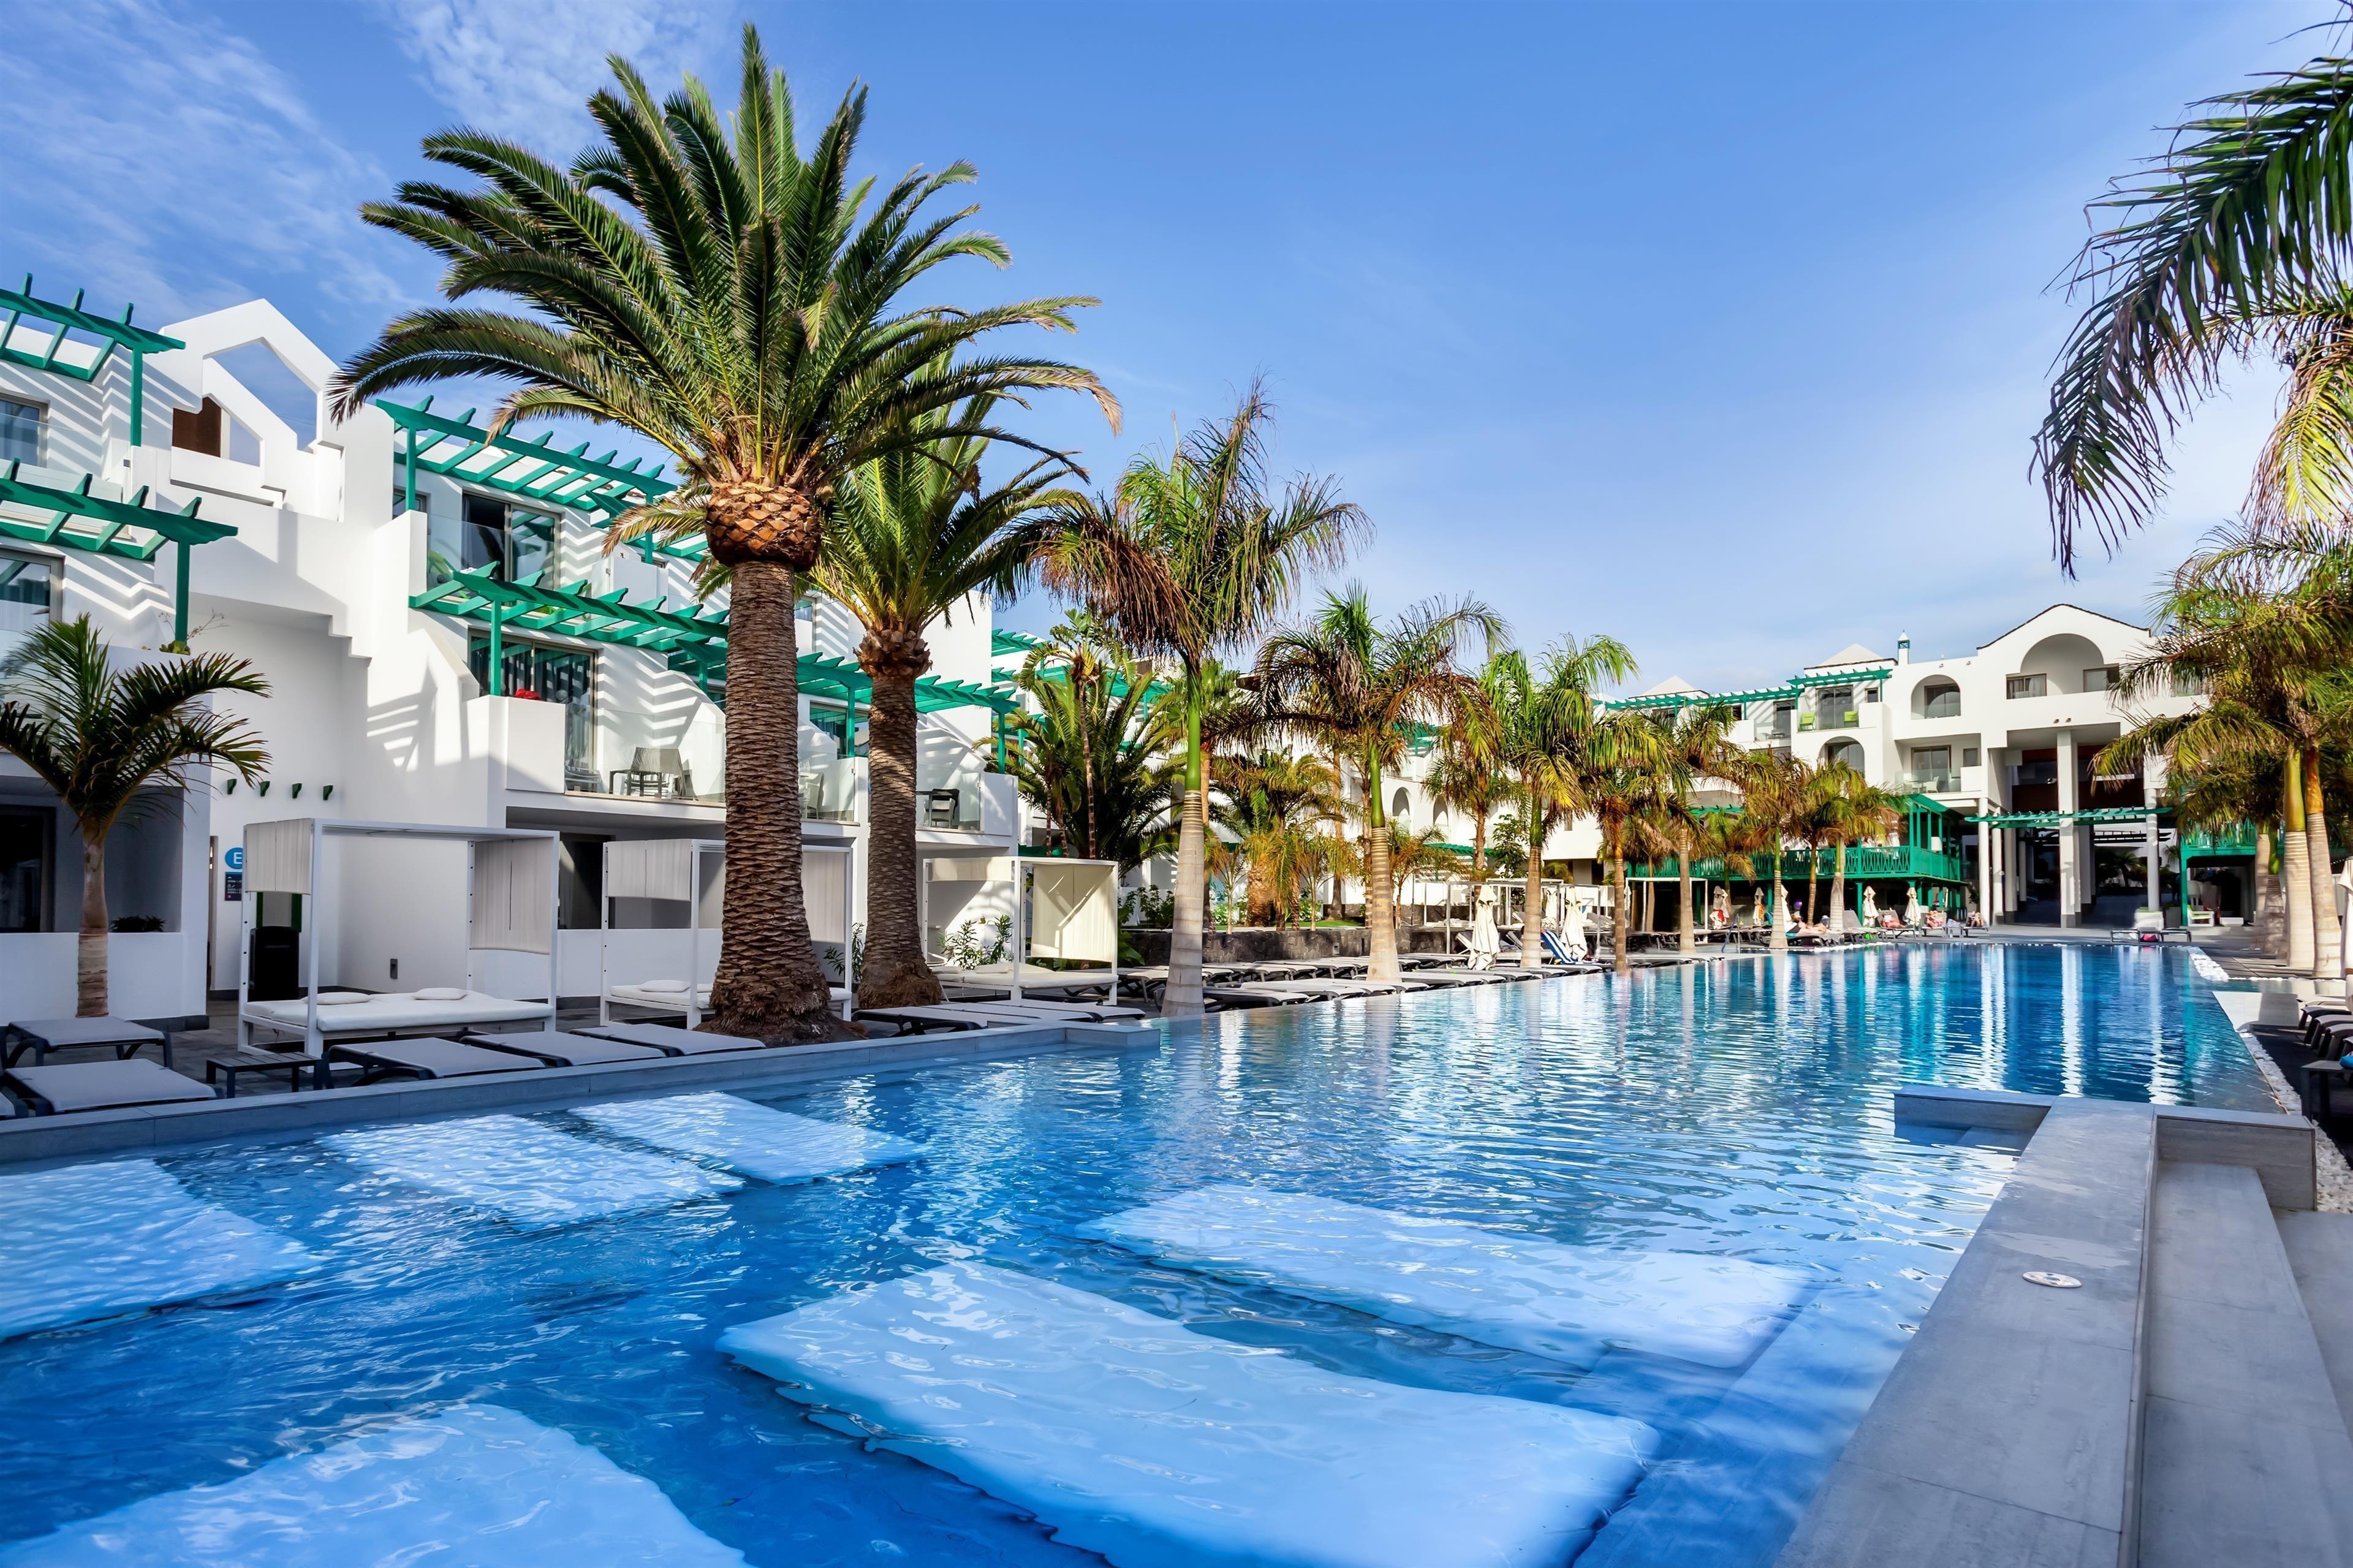 Courtesy of Barcelo Teguise Beach / Expedia